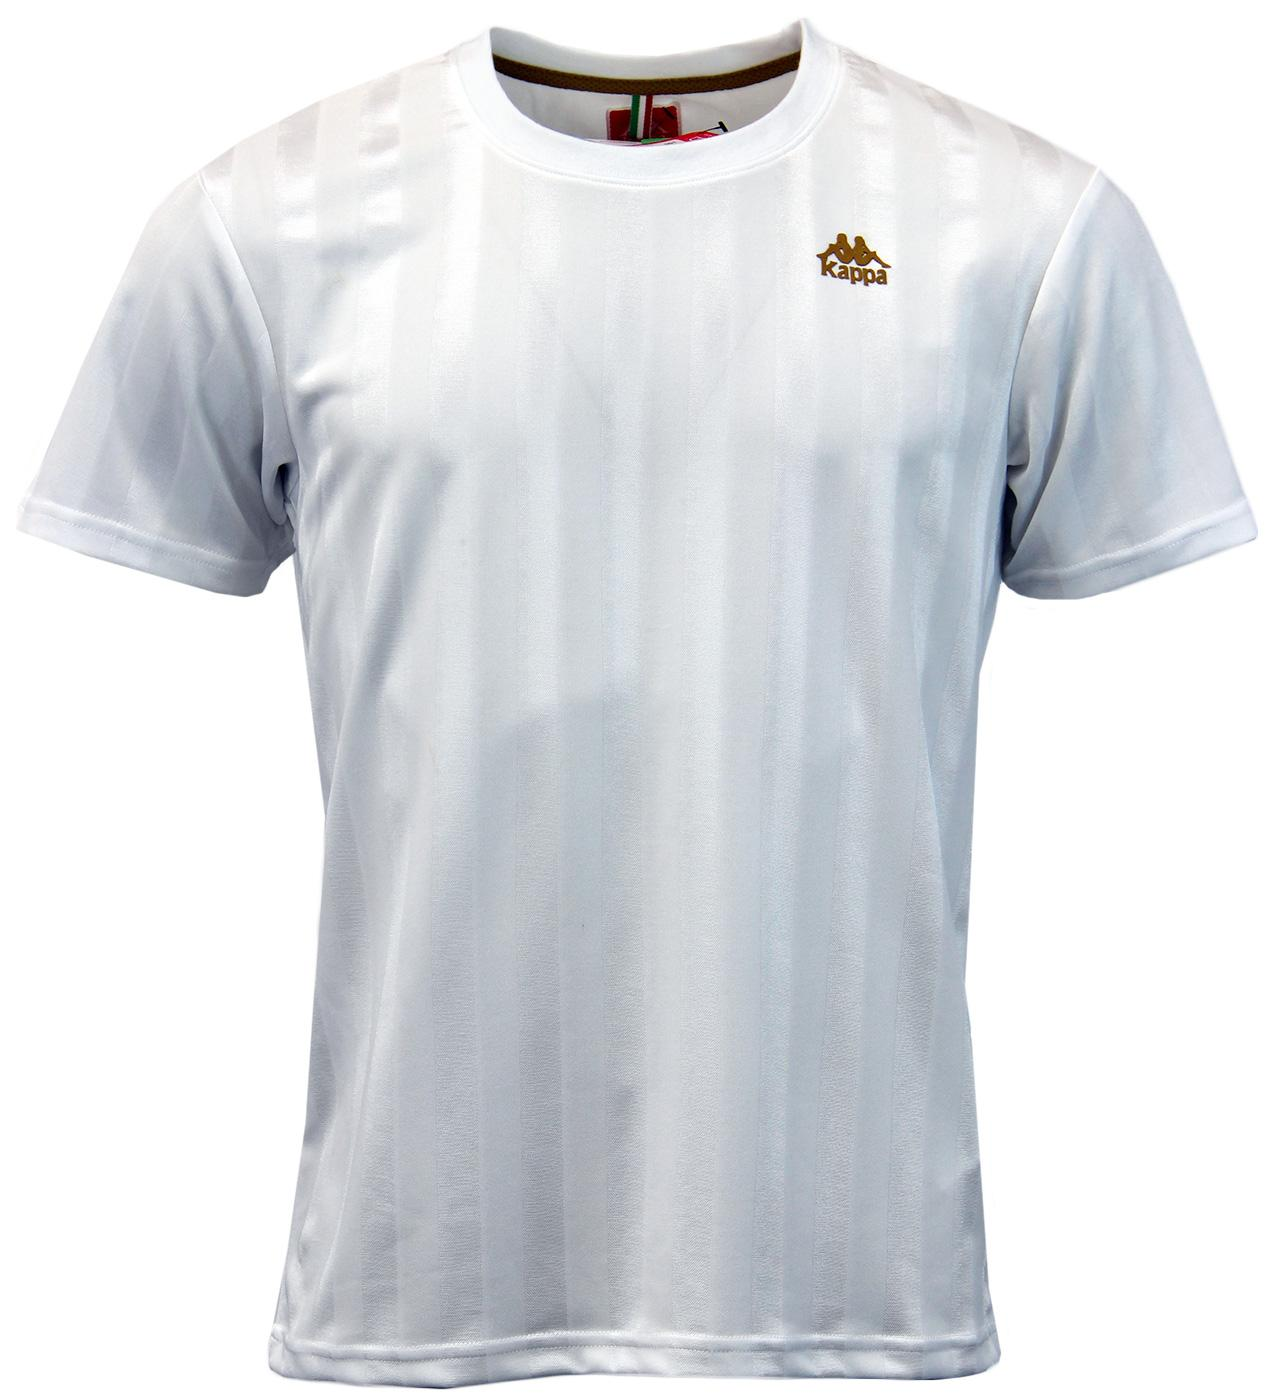 Brunton KAPPA Retro Seventies Tonal Stripe T-Shirt